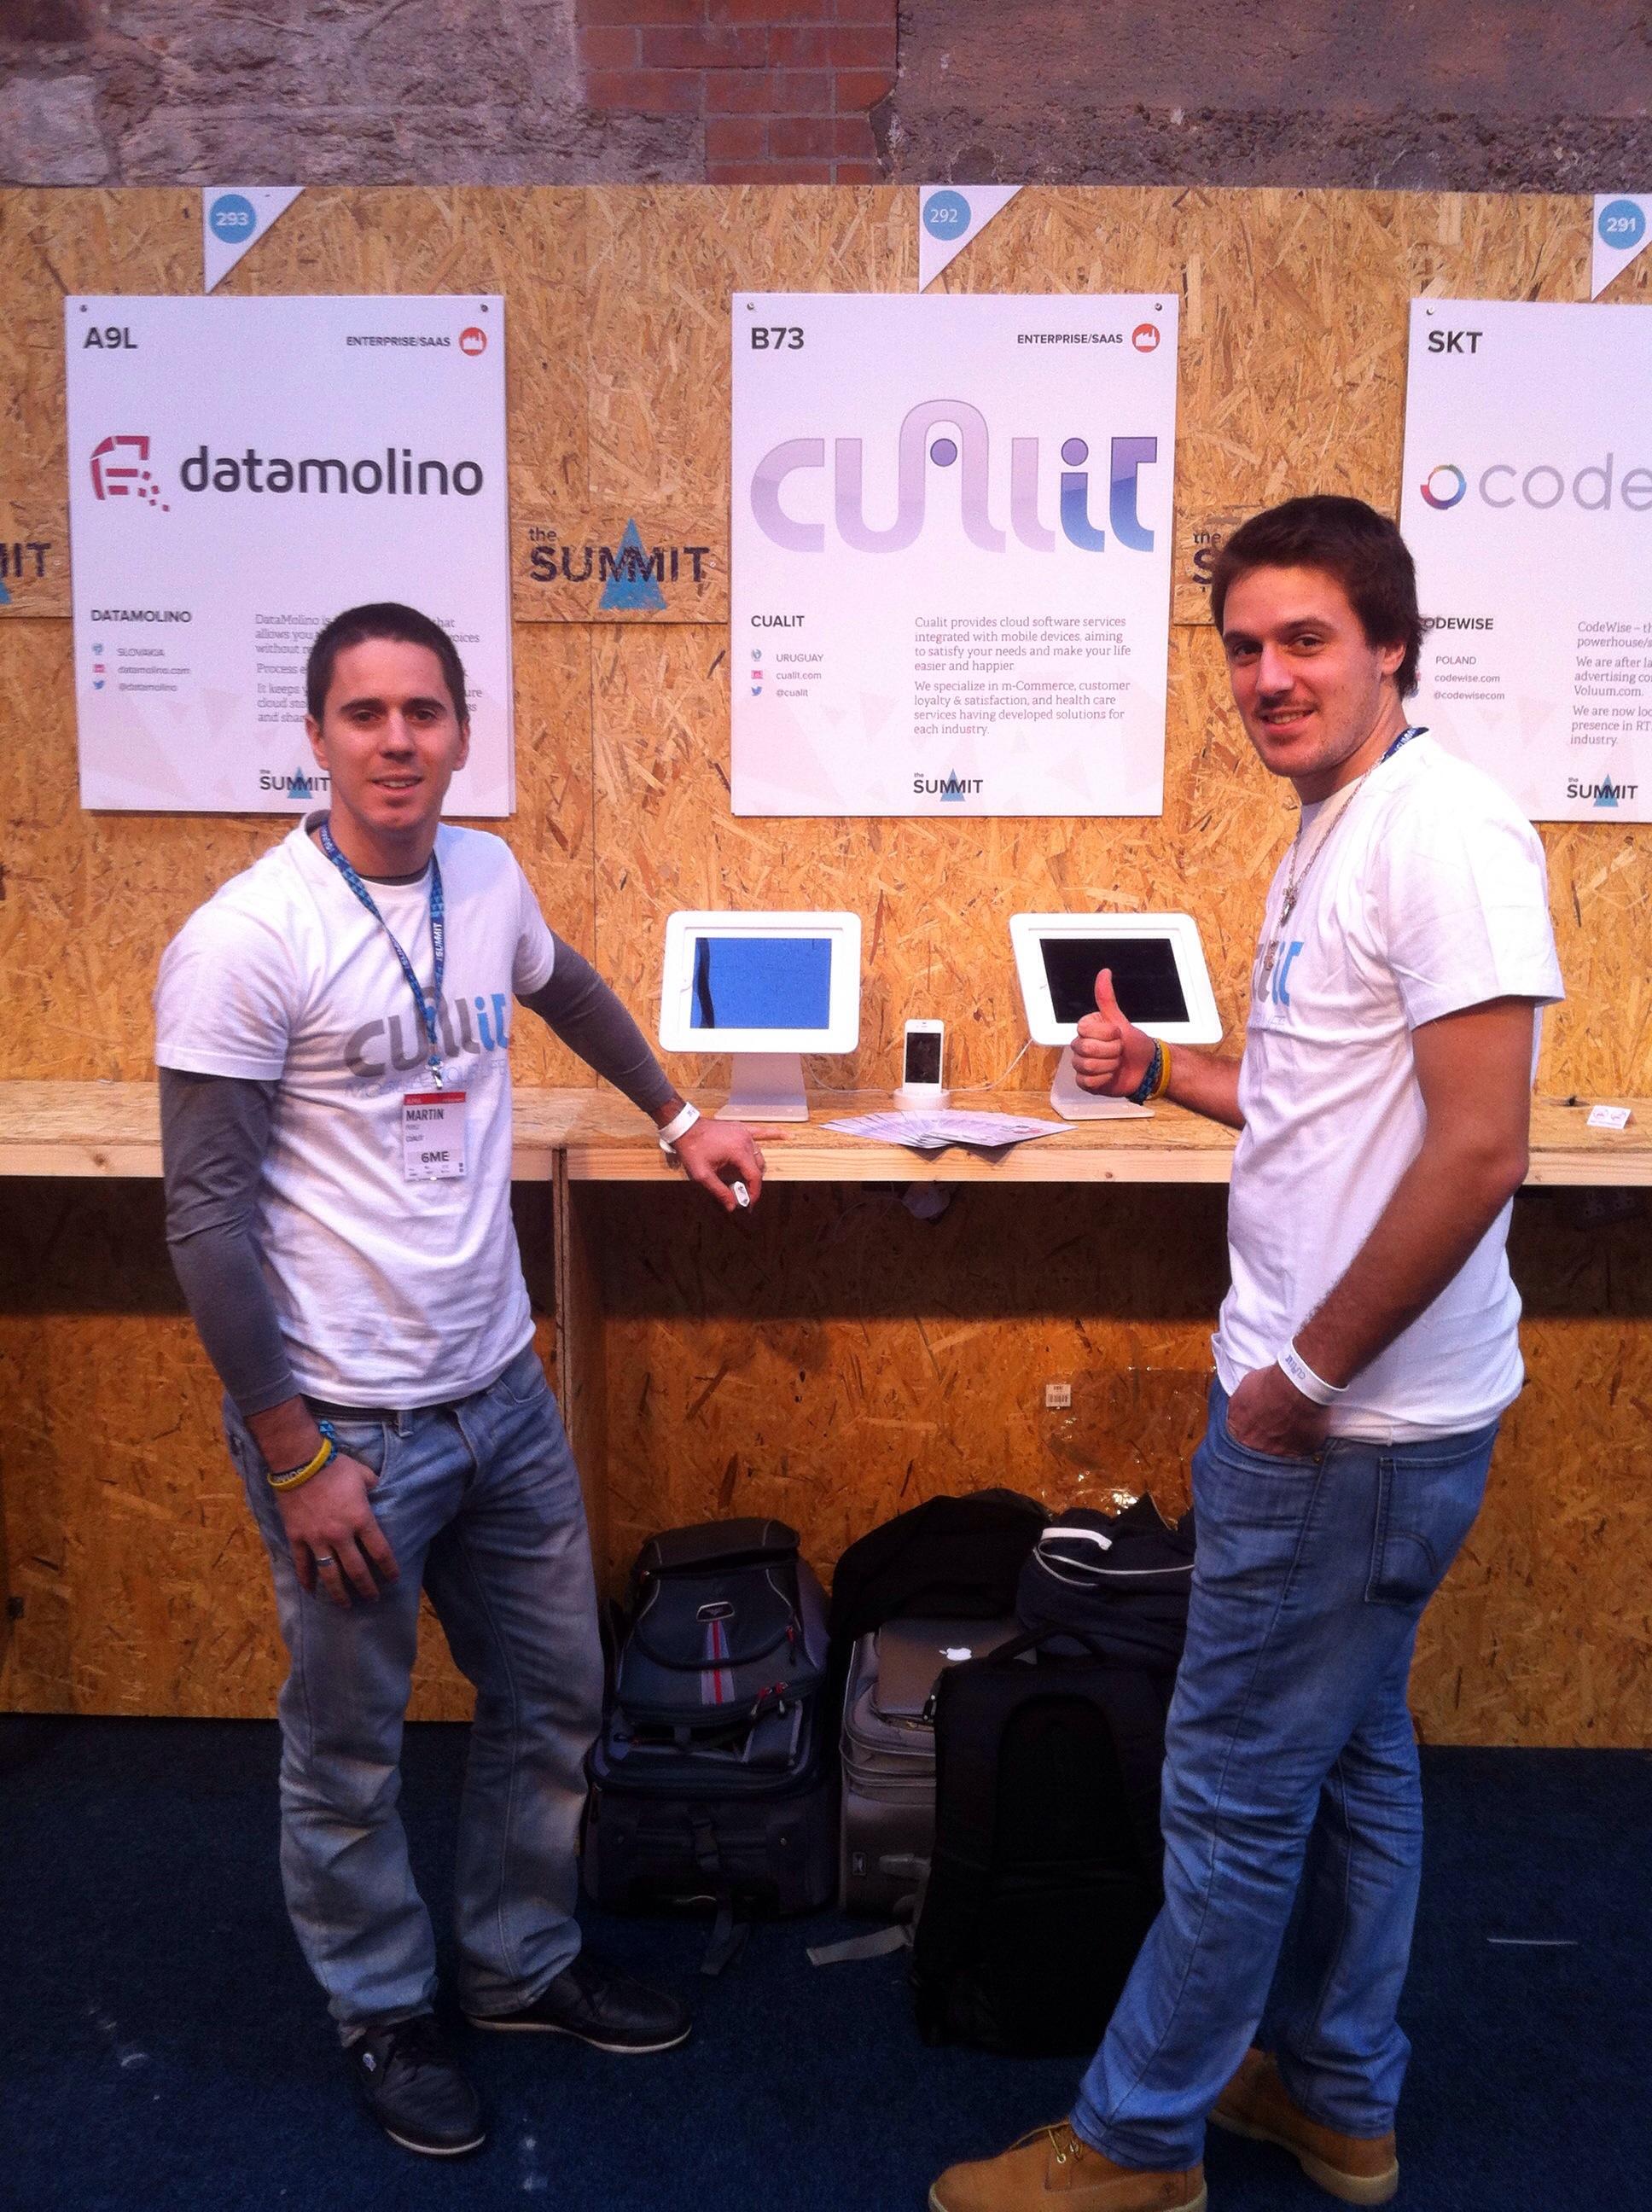 Cualit Founders @ WebSummit 2013